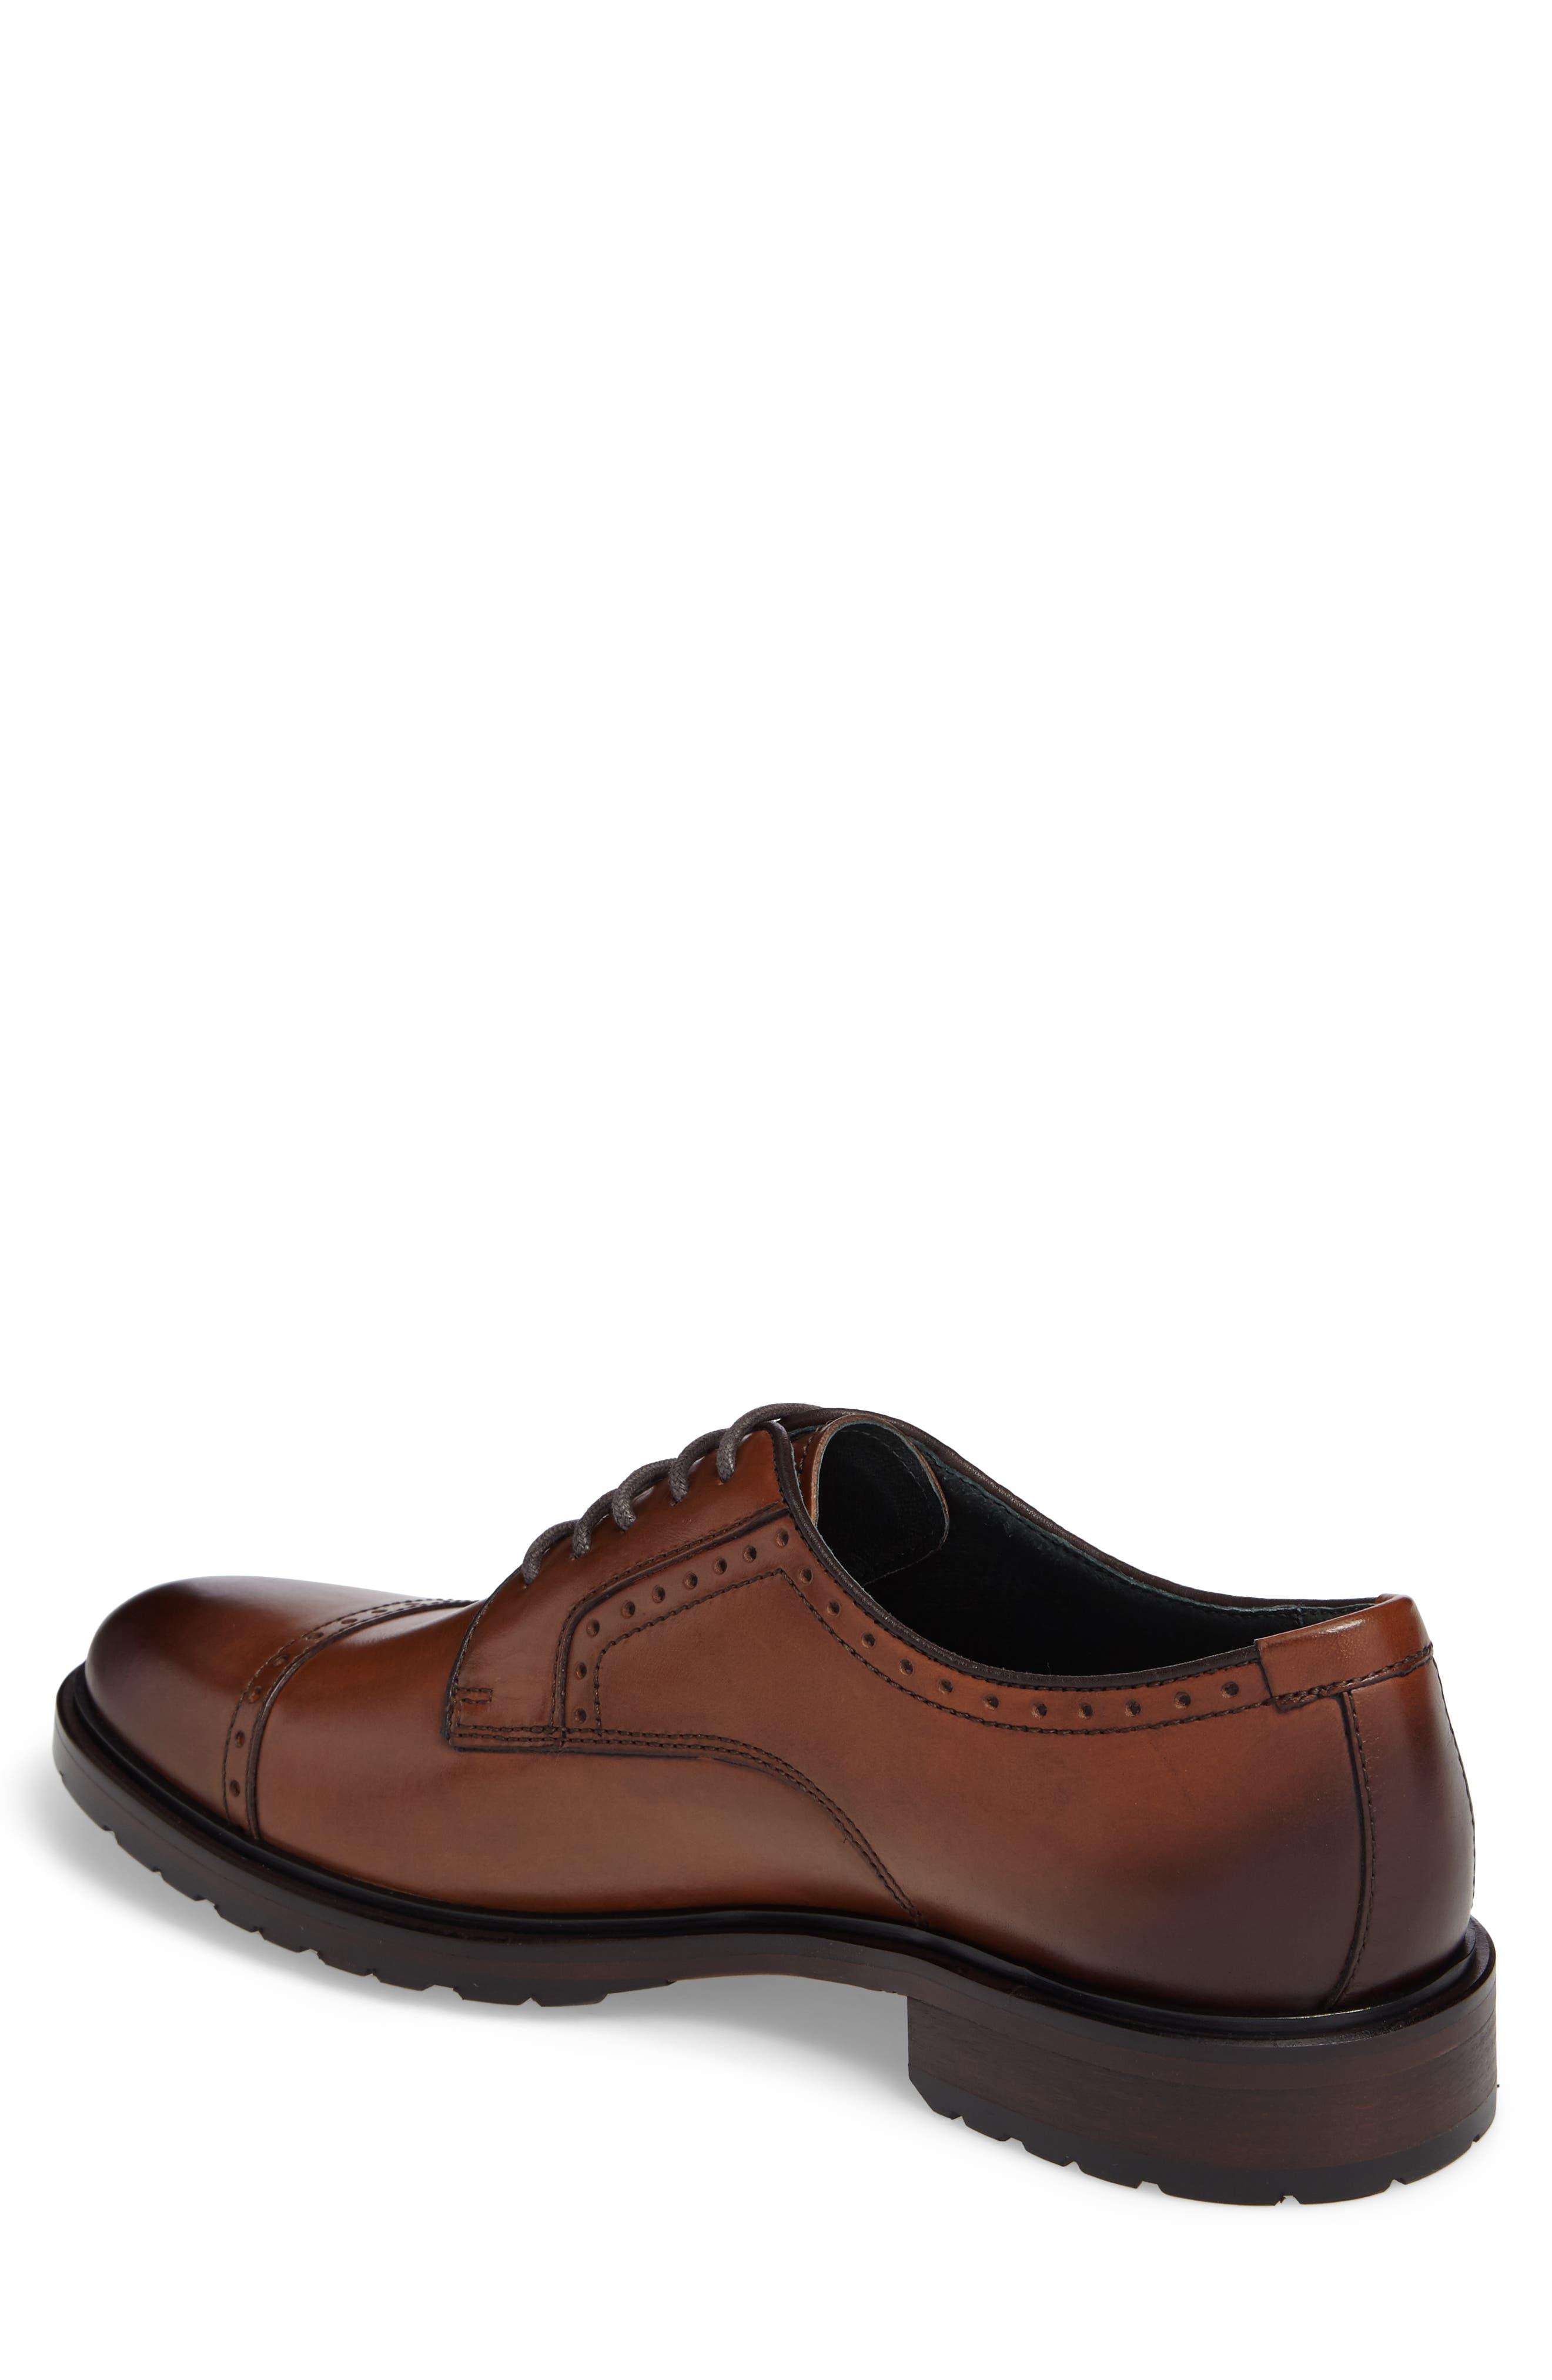 Myles Cap Toe Derby,                             Alternate thumbnail 2, color,                             Dark Cognac Leather